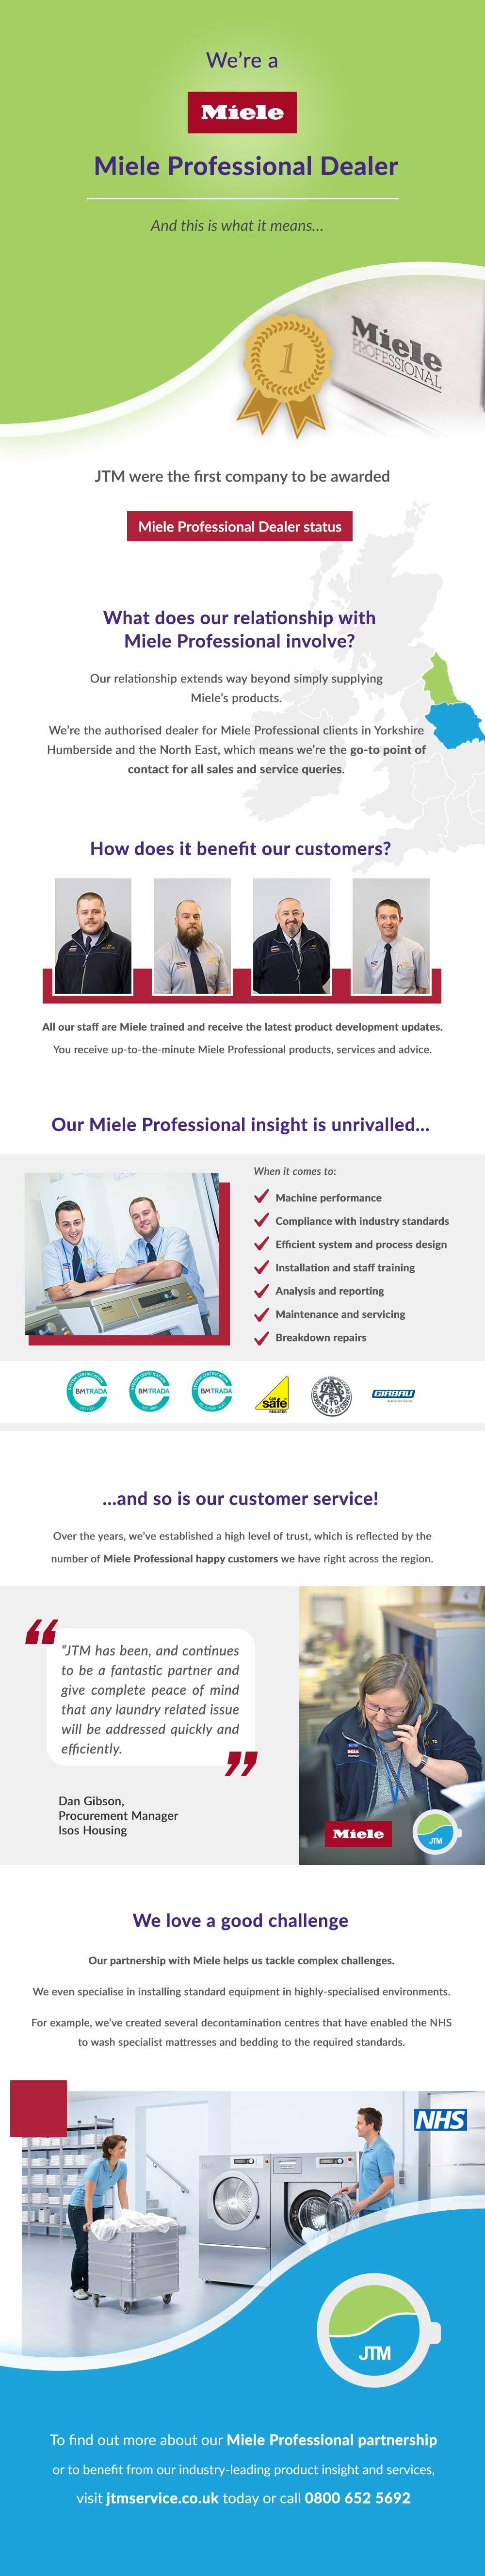 JTM-infographic-Miele-Partnership